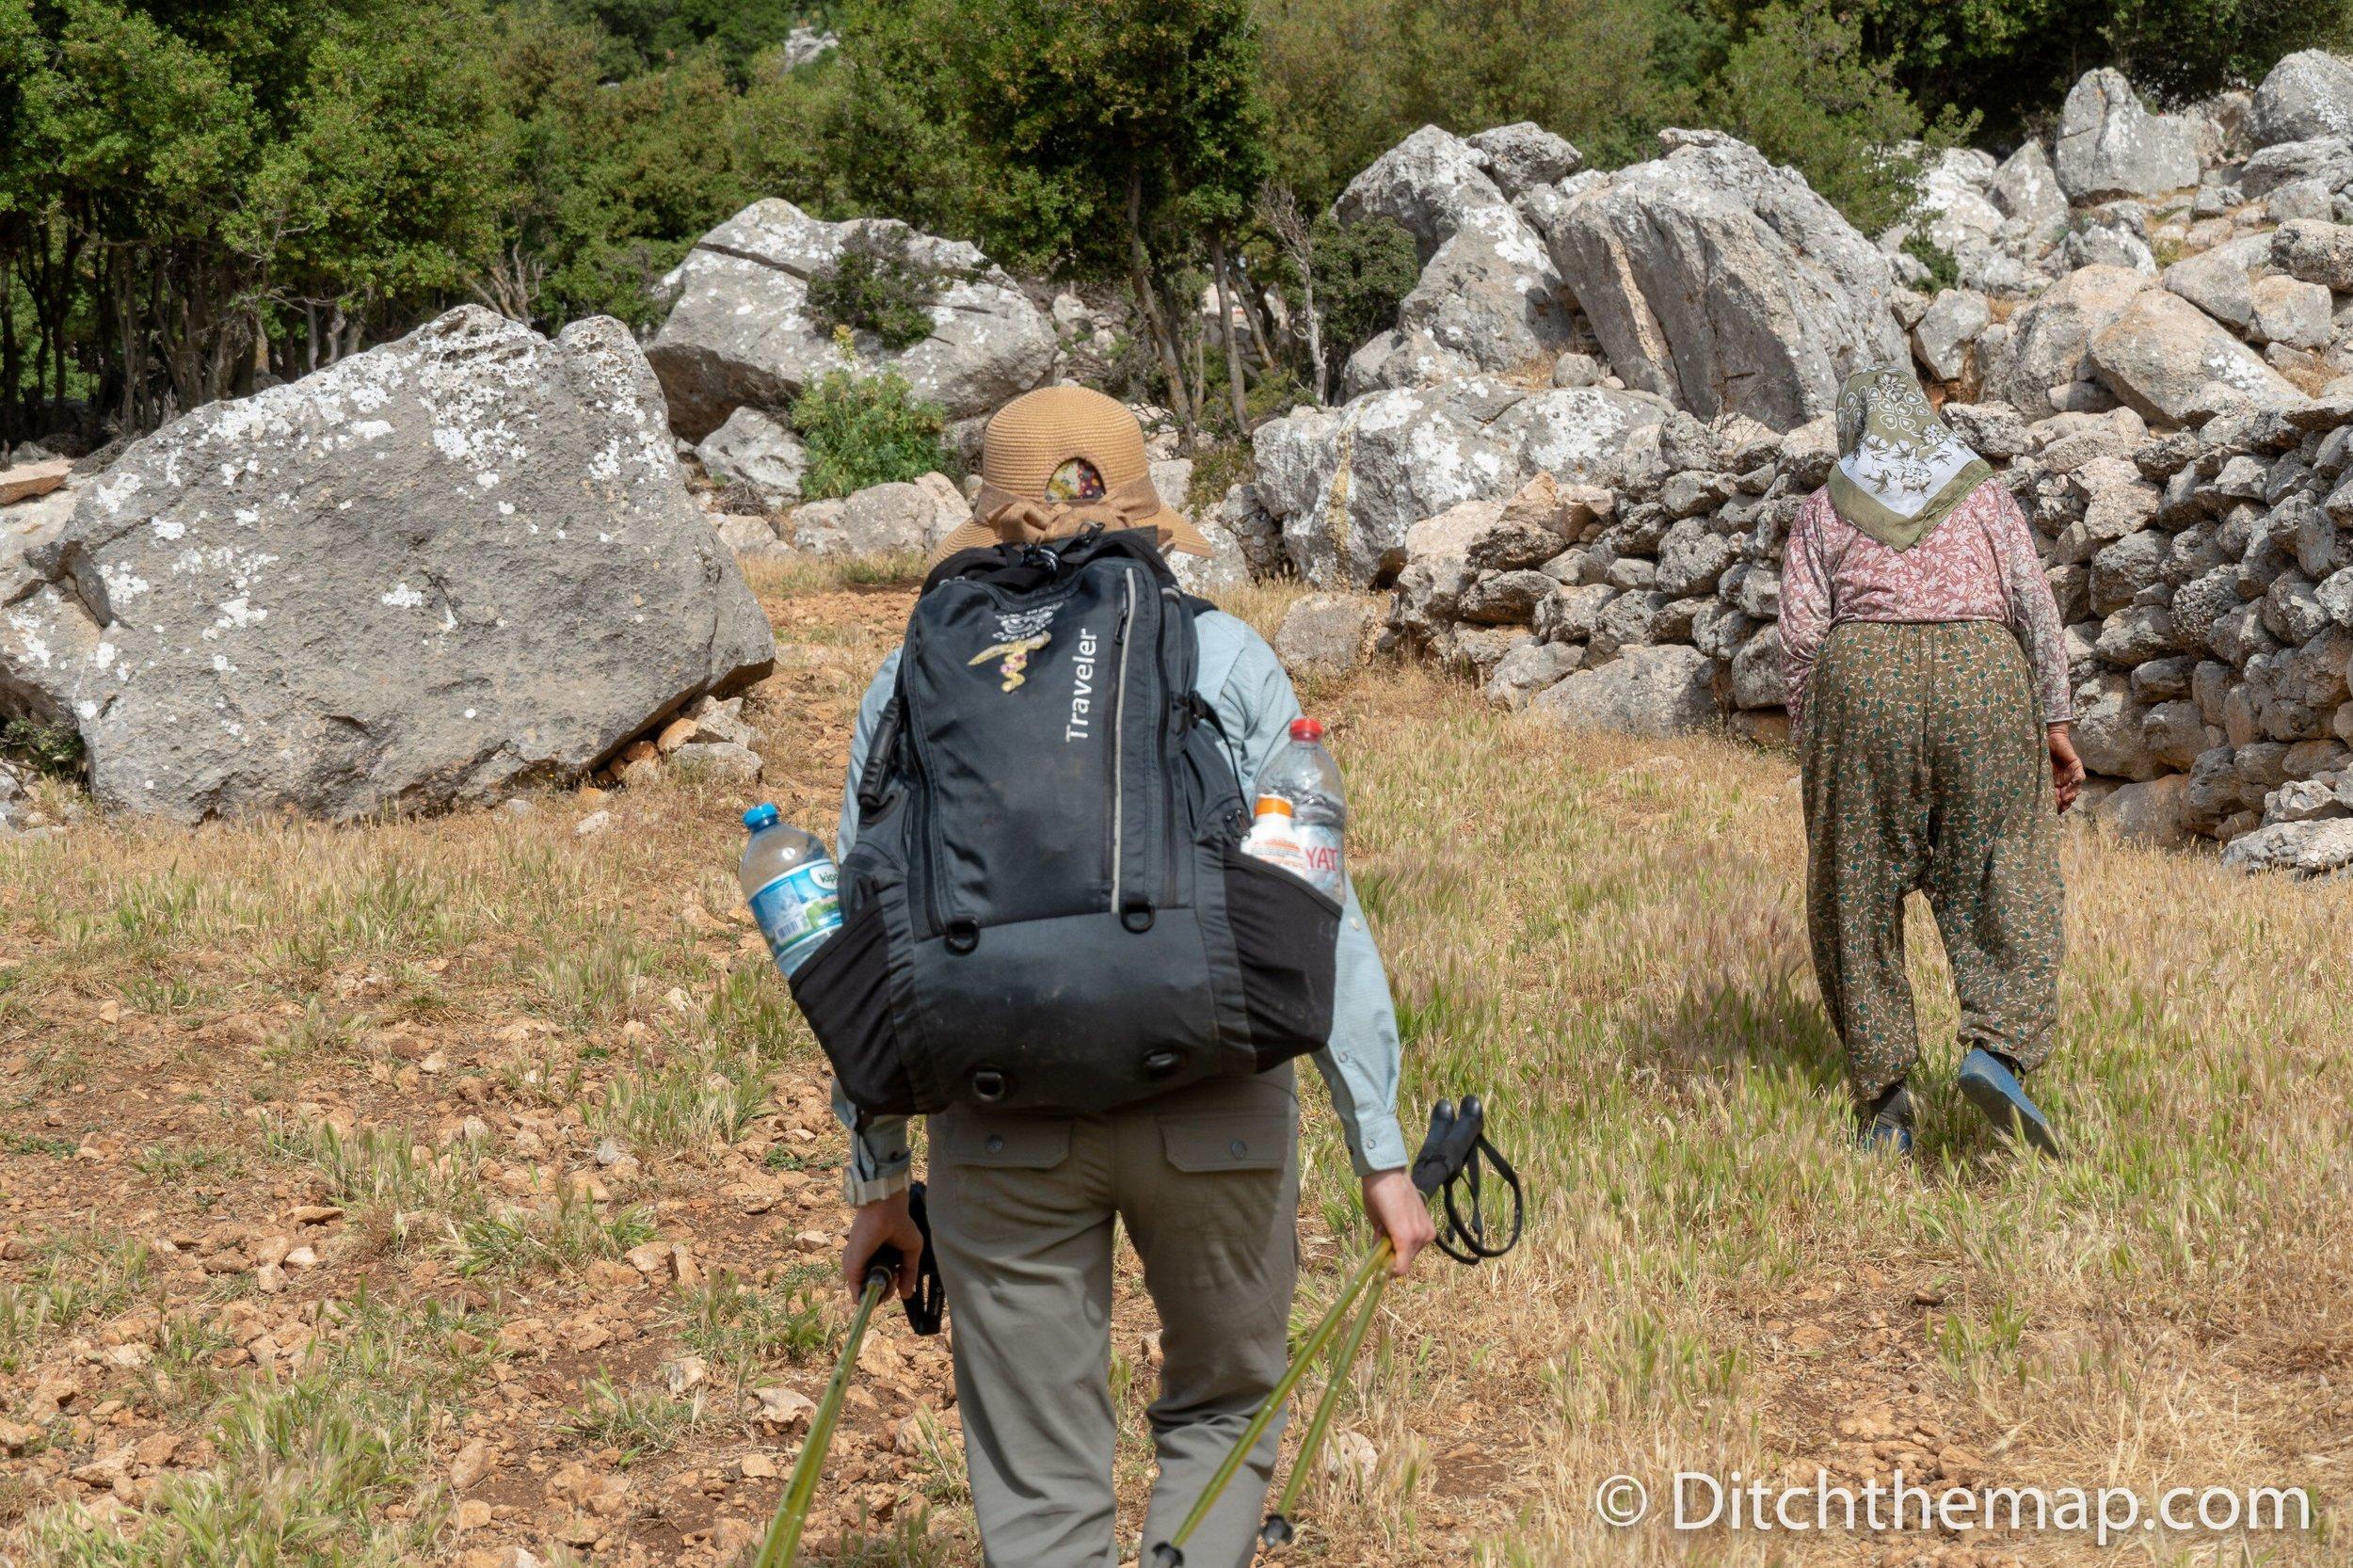 We follow a villager to her home along the Lycian Way between Saribelen and Gökçeören